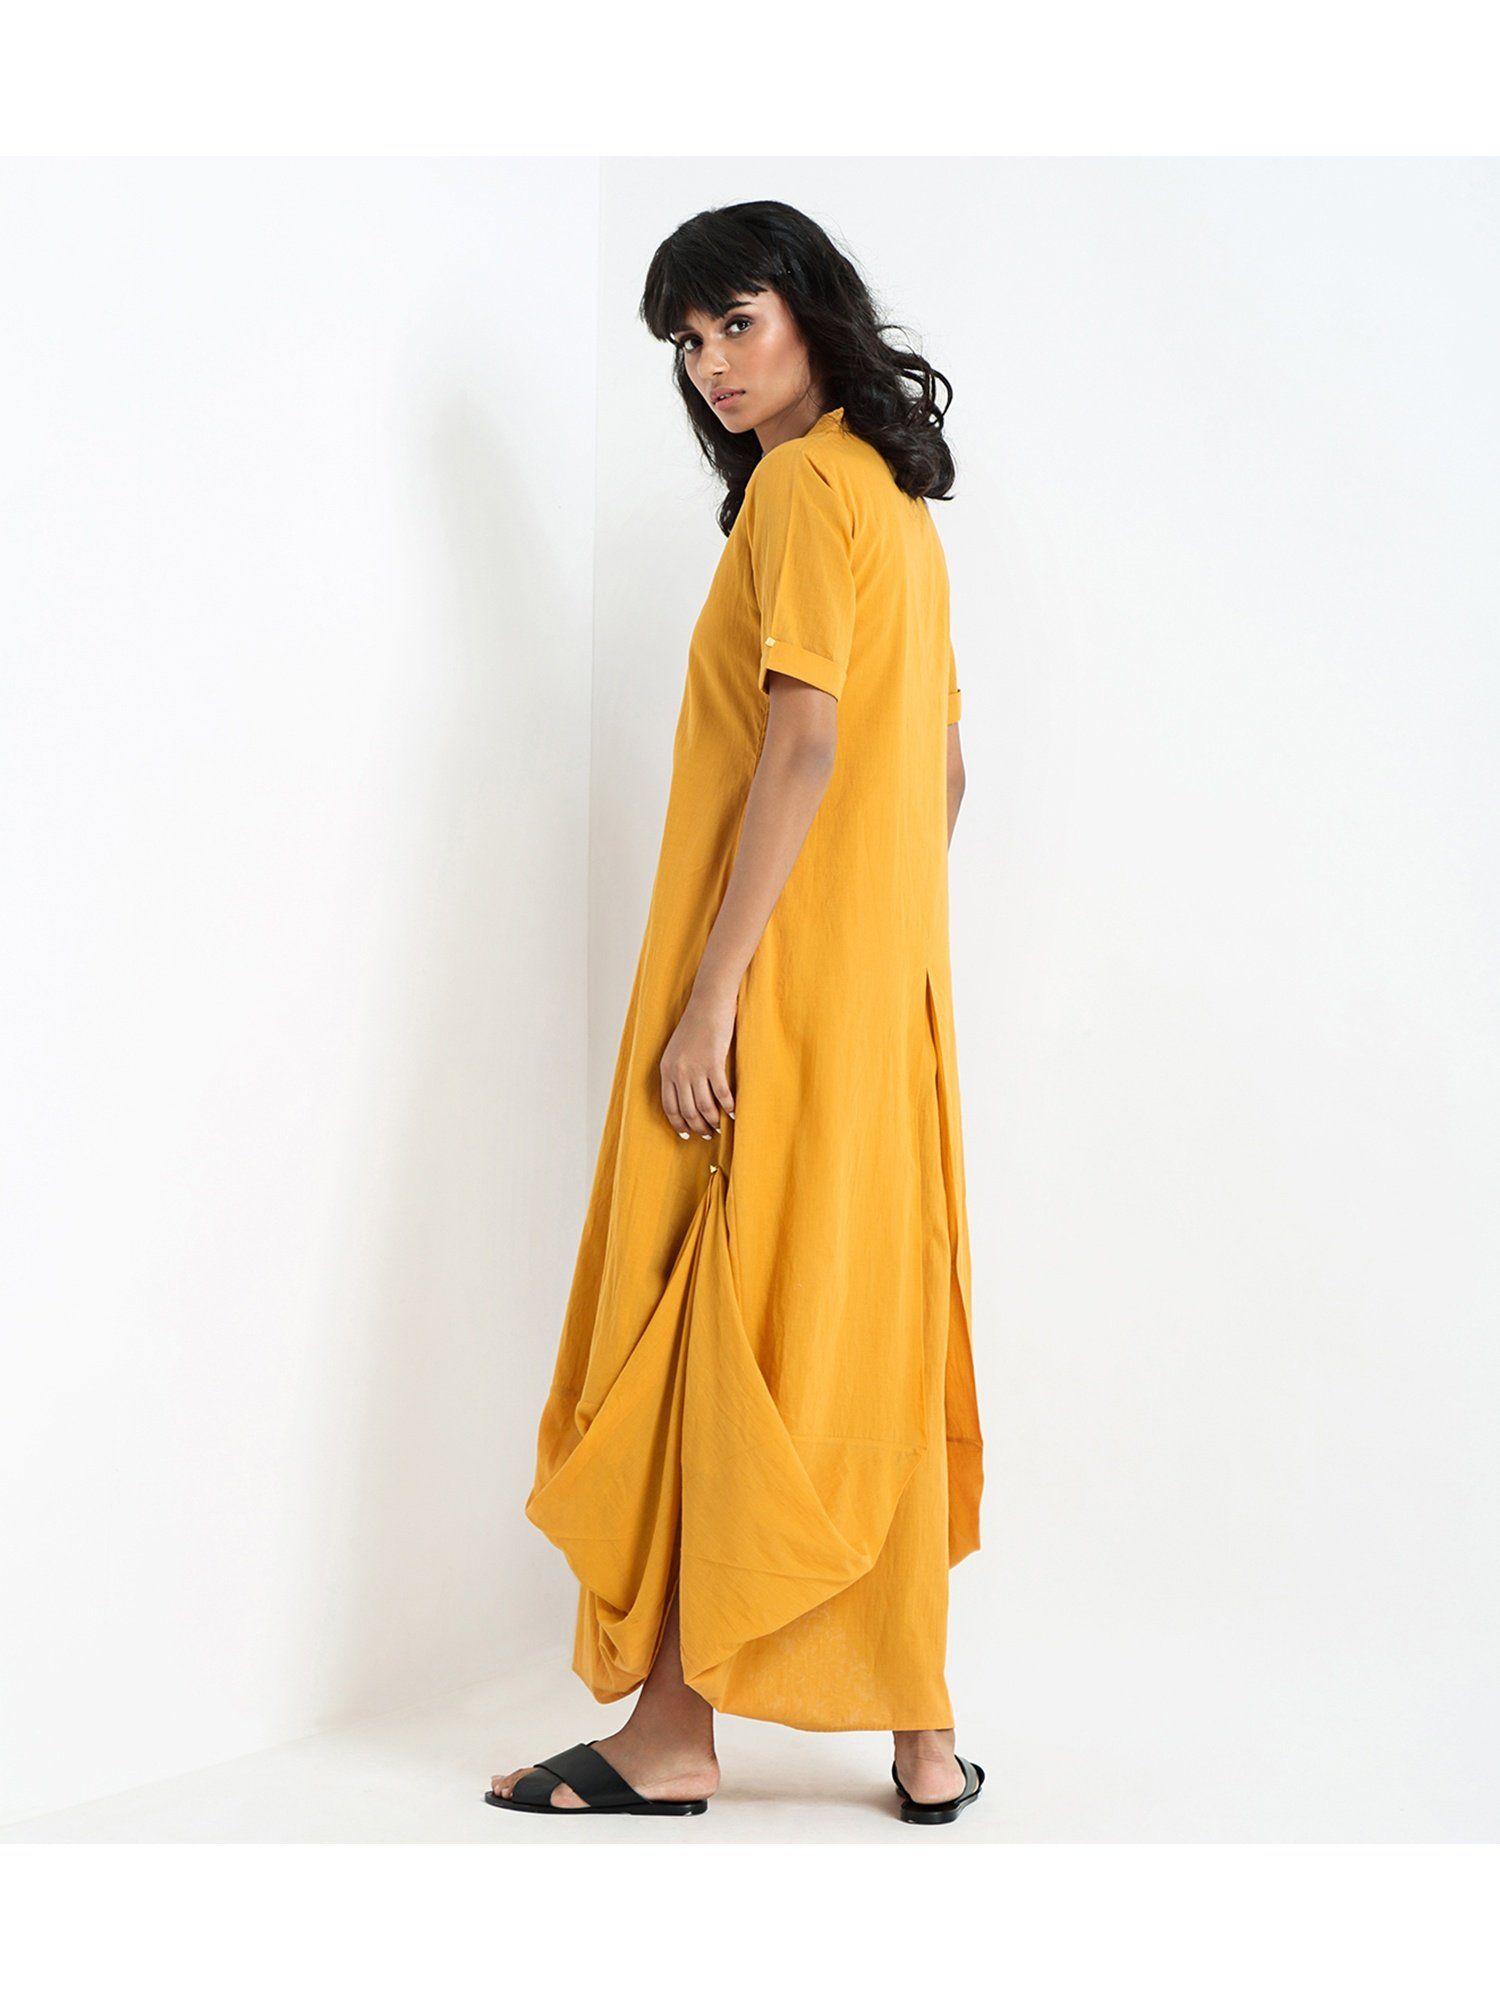 d0e77945a605 Khara Kapas Dresses : Buy Khara Kapas Yellow Heatwave Dress Online ...